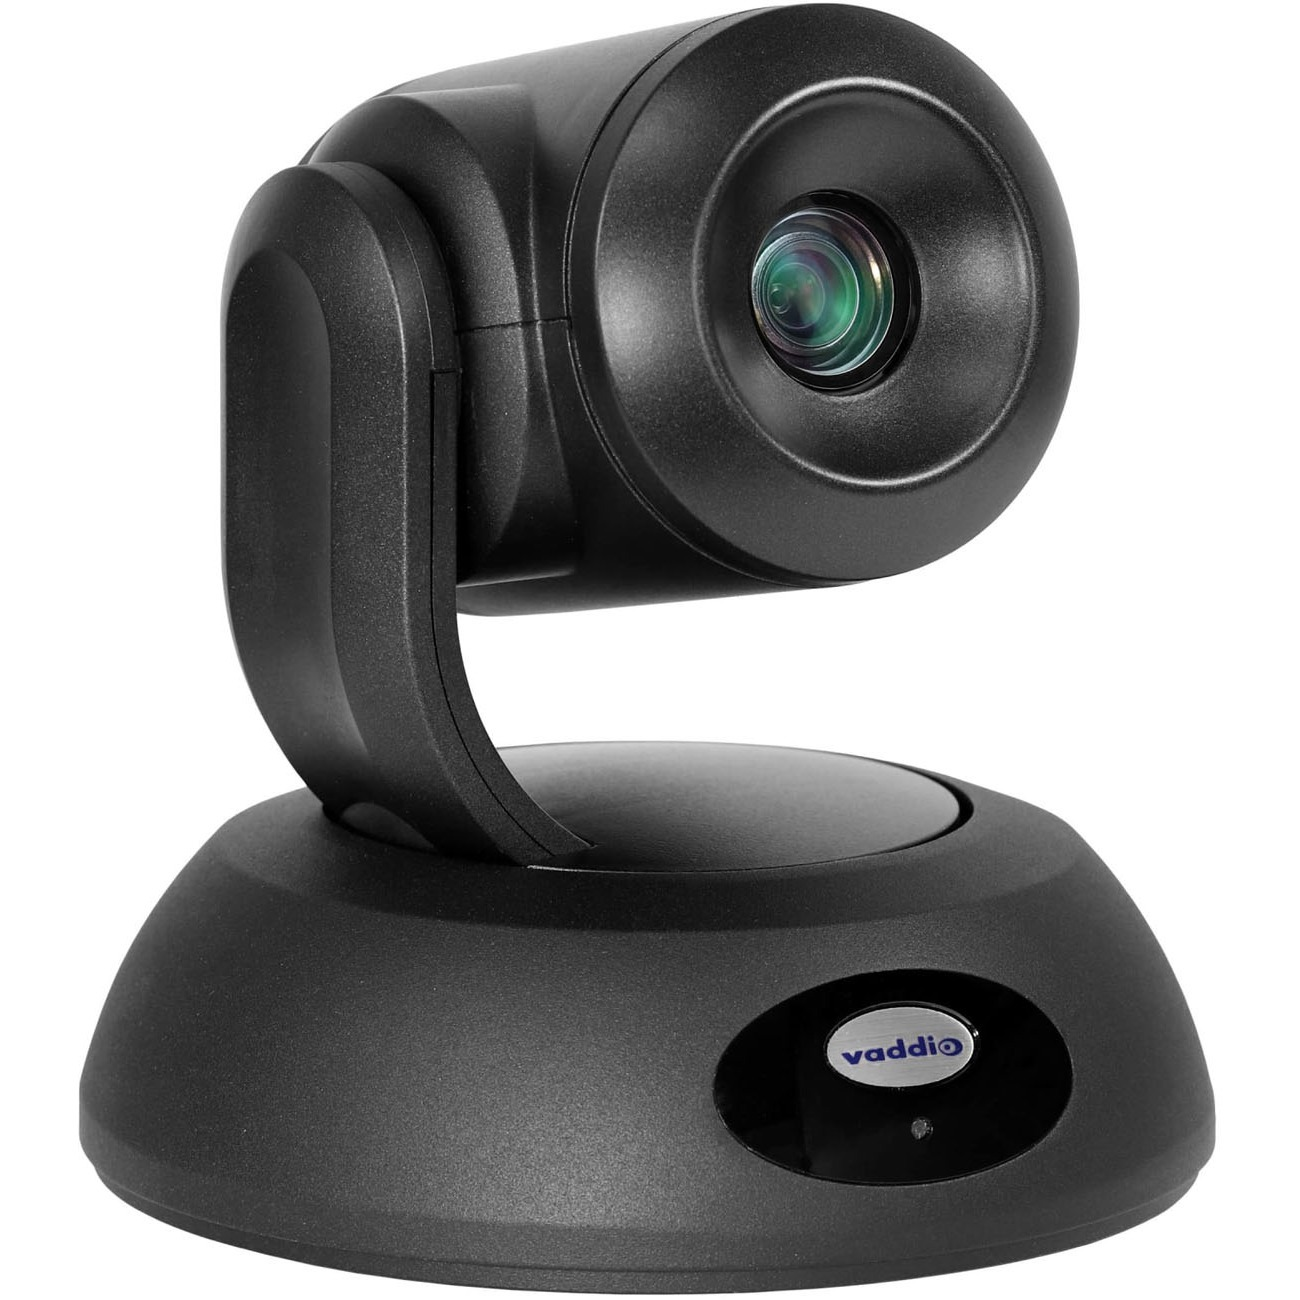 Vaddio RoboSHOT Elite Video Conferencing Camera - 8.5 Megapixel - 60 fps - Black_subImage_1